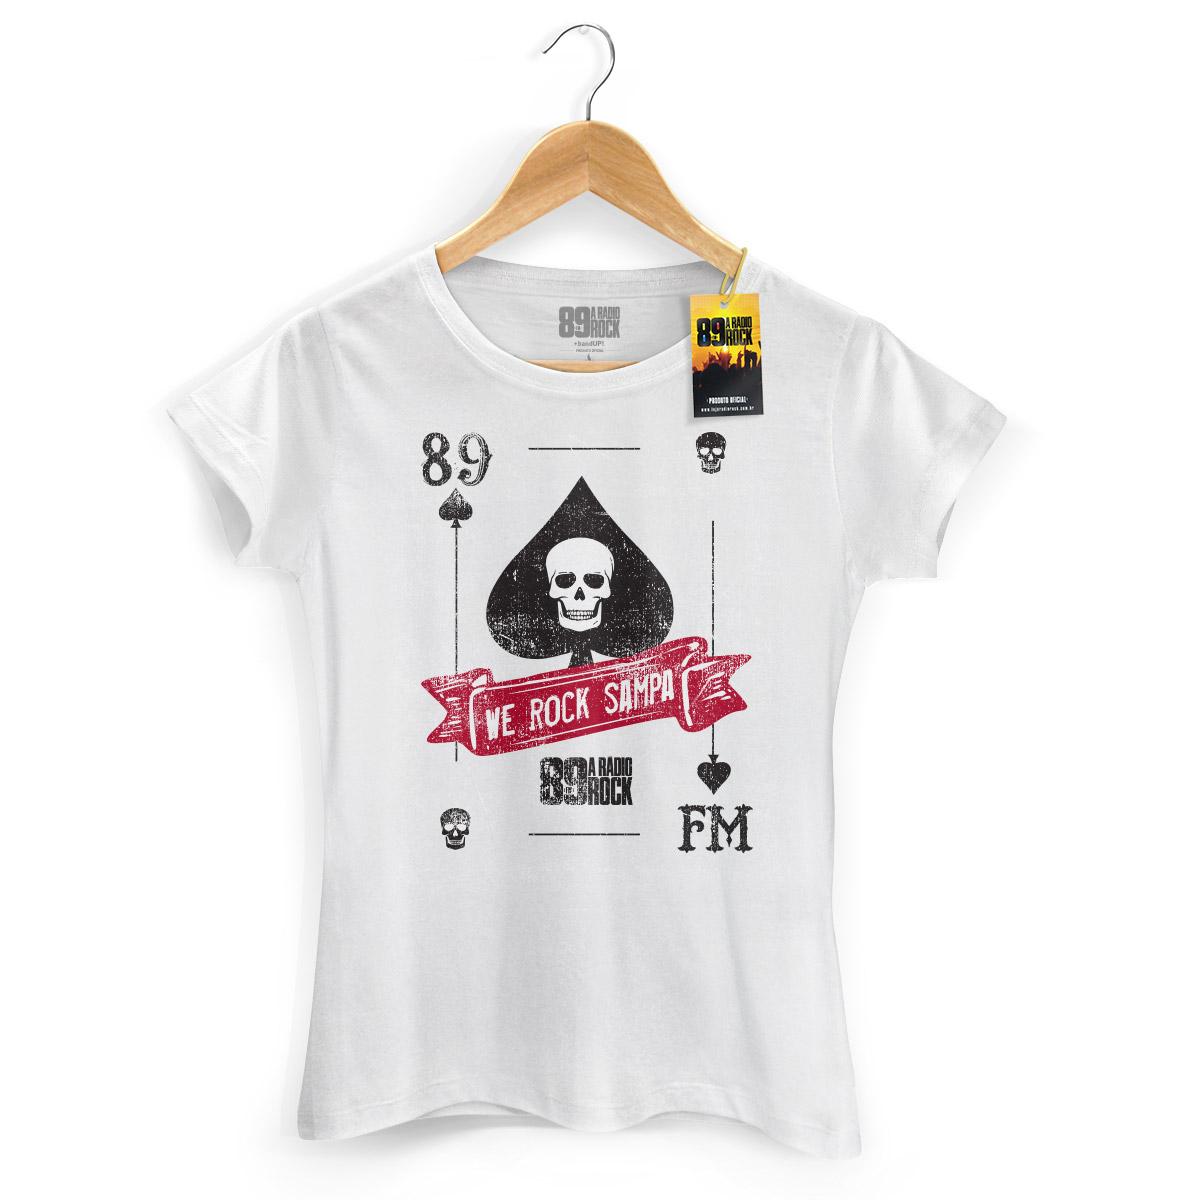 Camiseta Feminina 89 FM A Rádio Rock We Rock Sampa Card